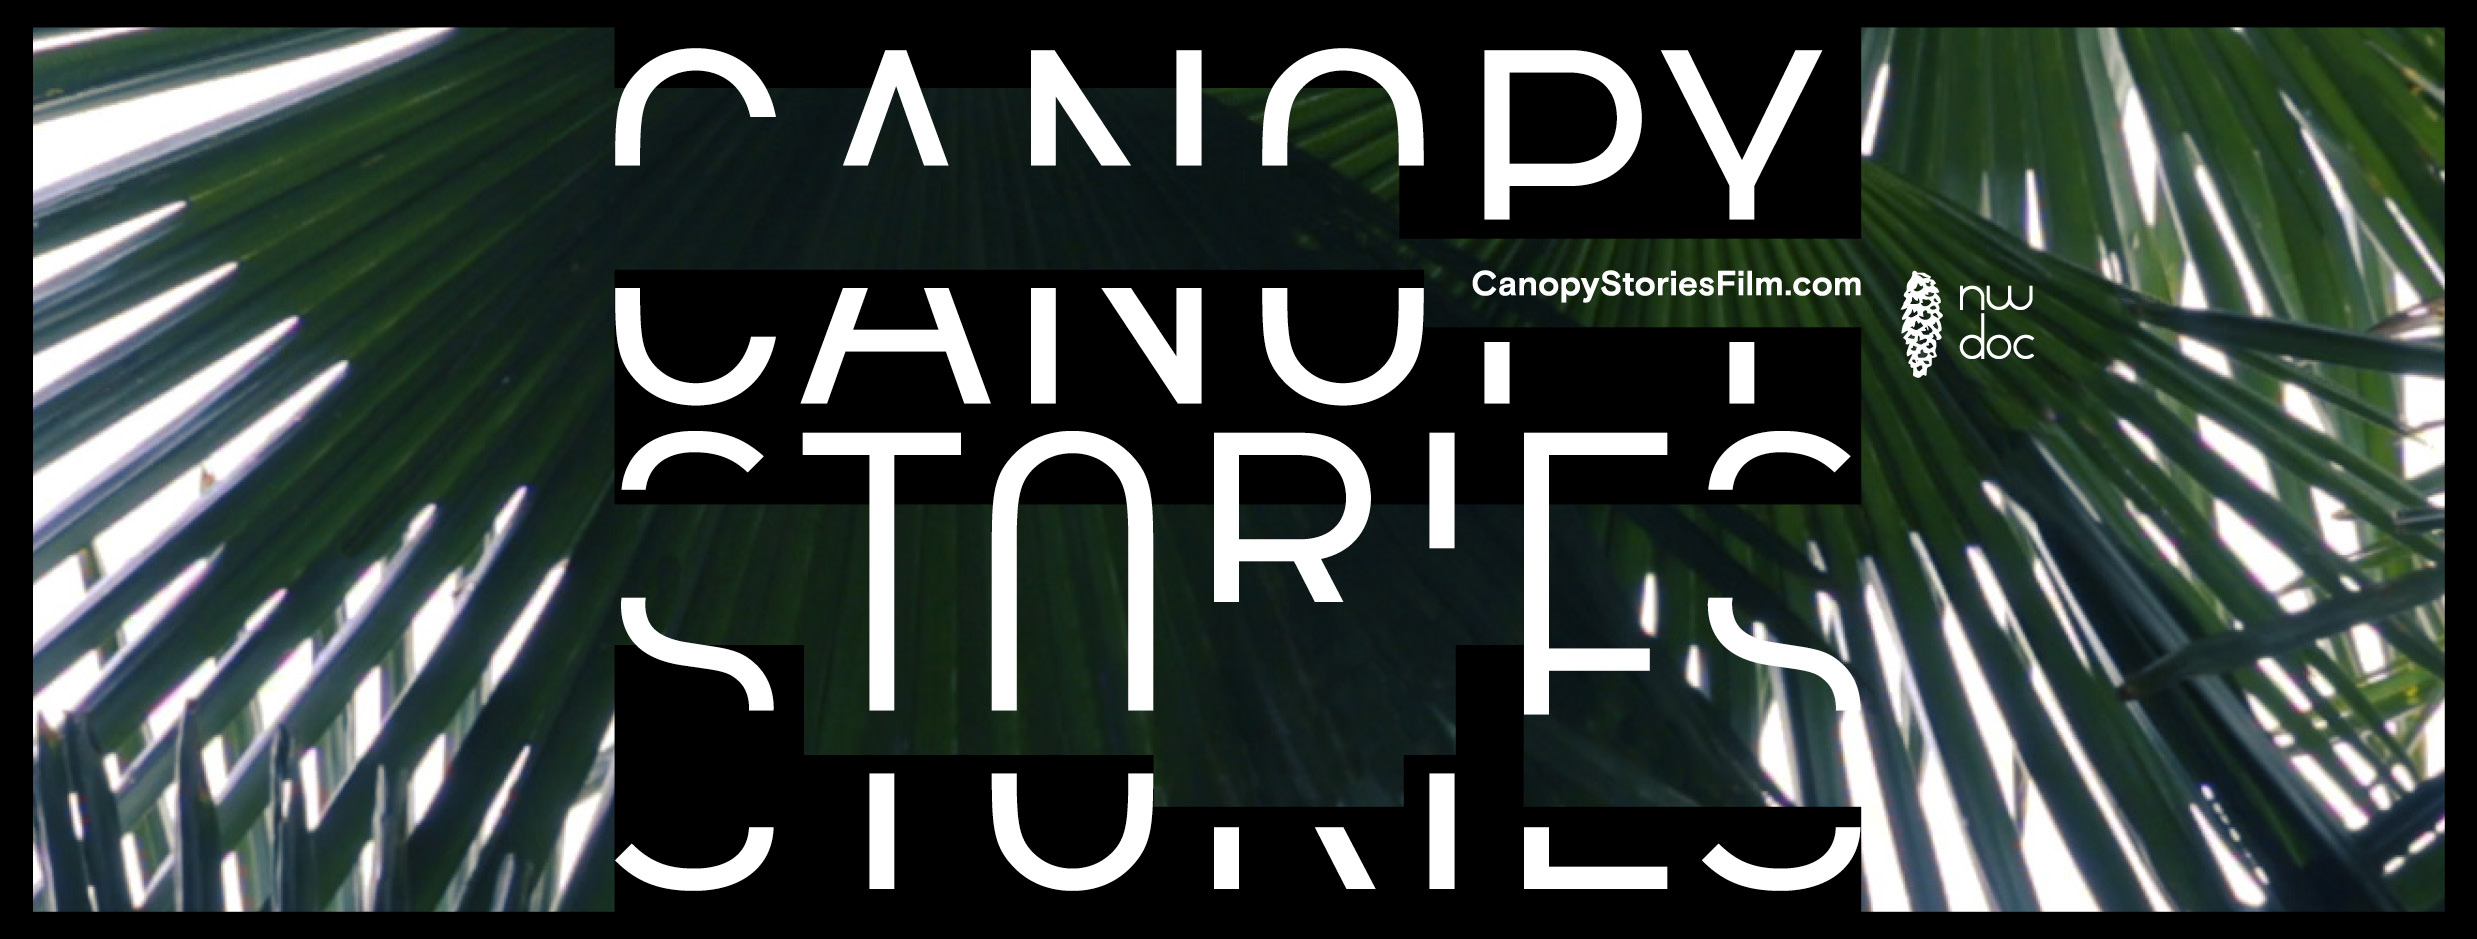 CanopyStories-FacebookCanvas3.jpg